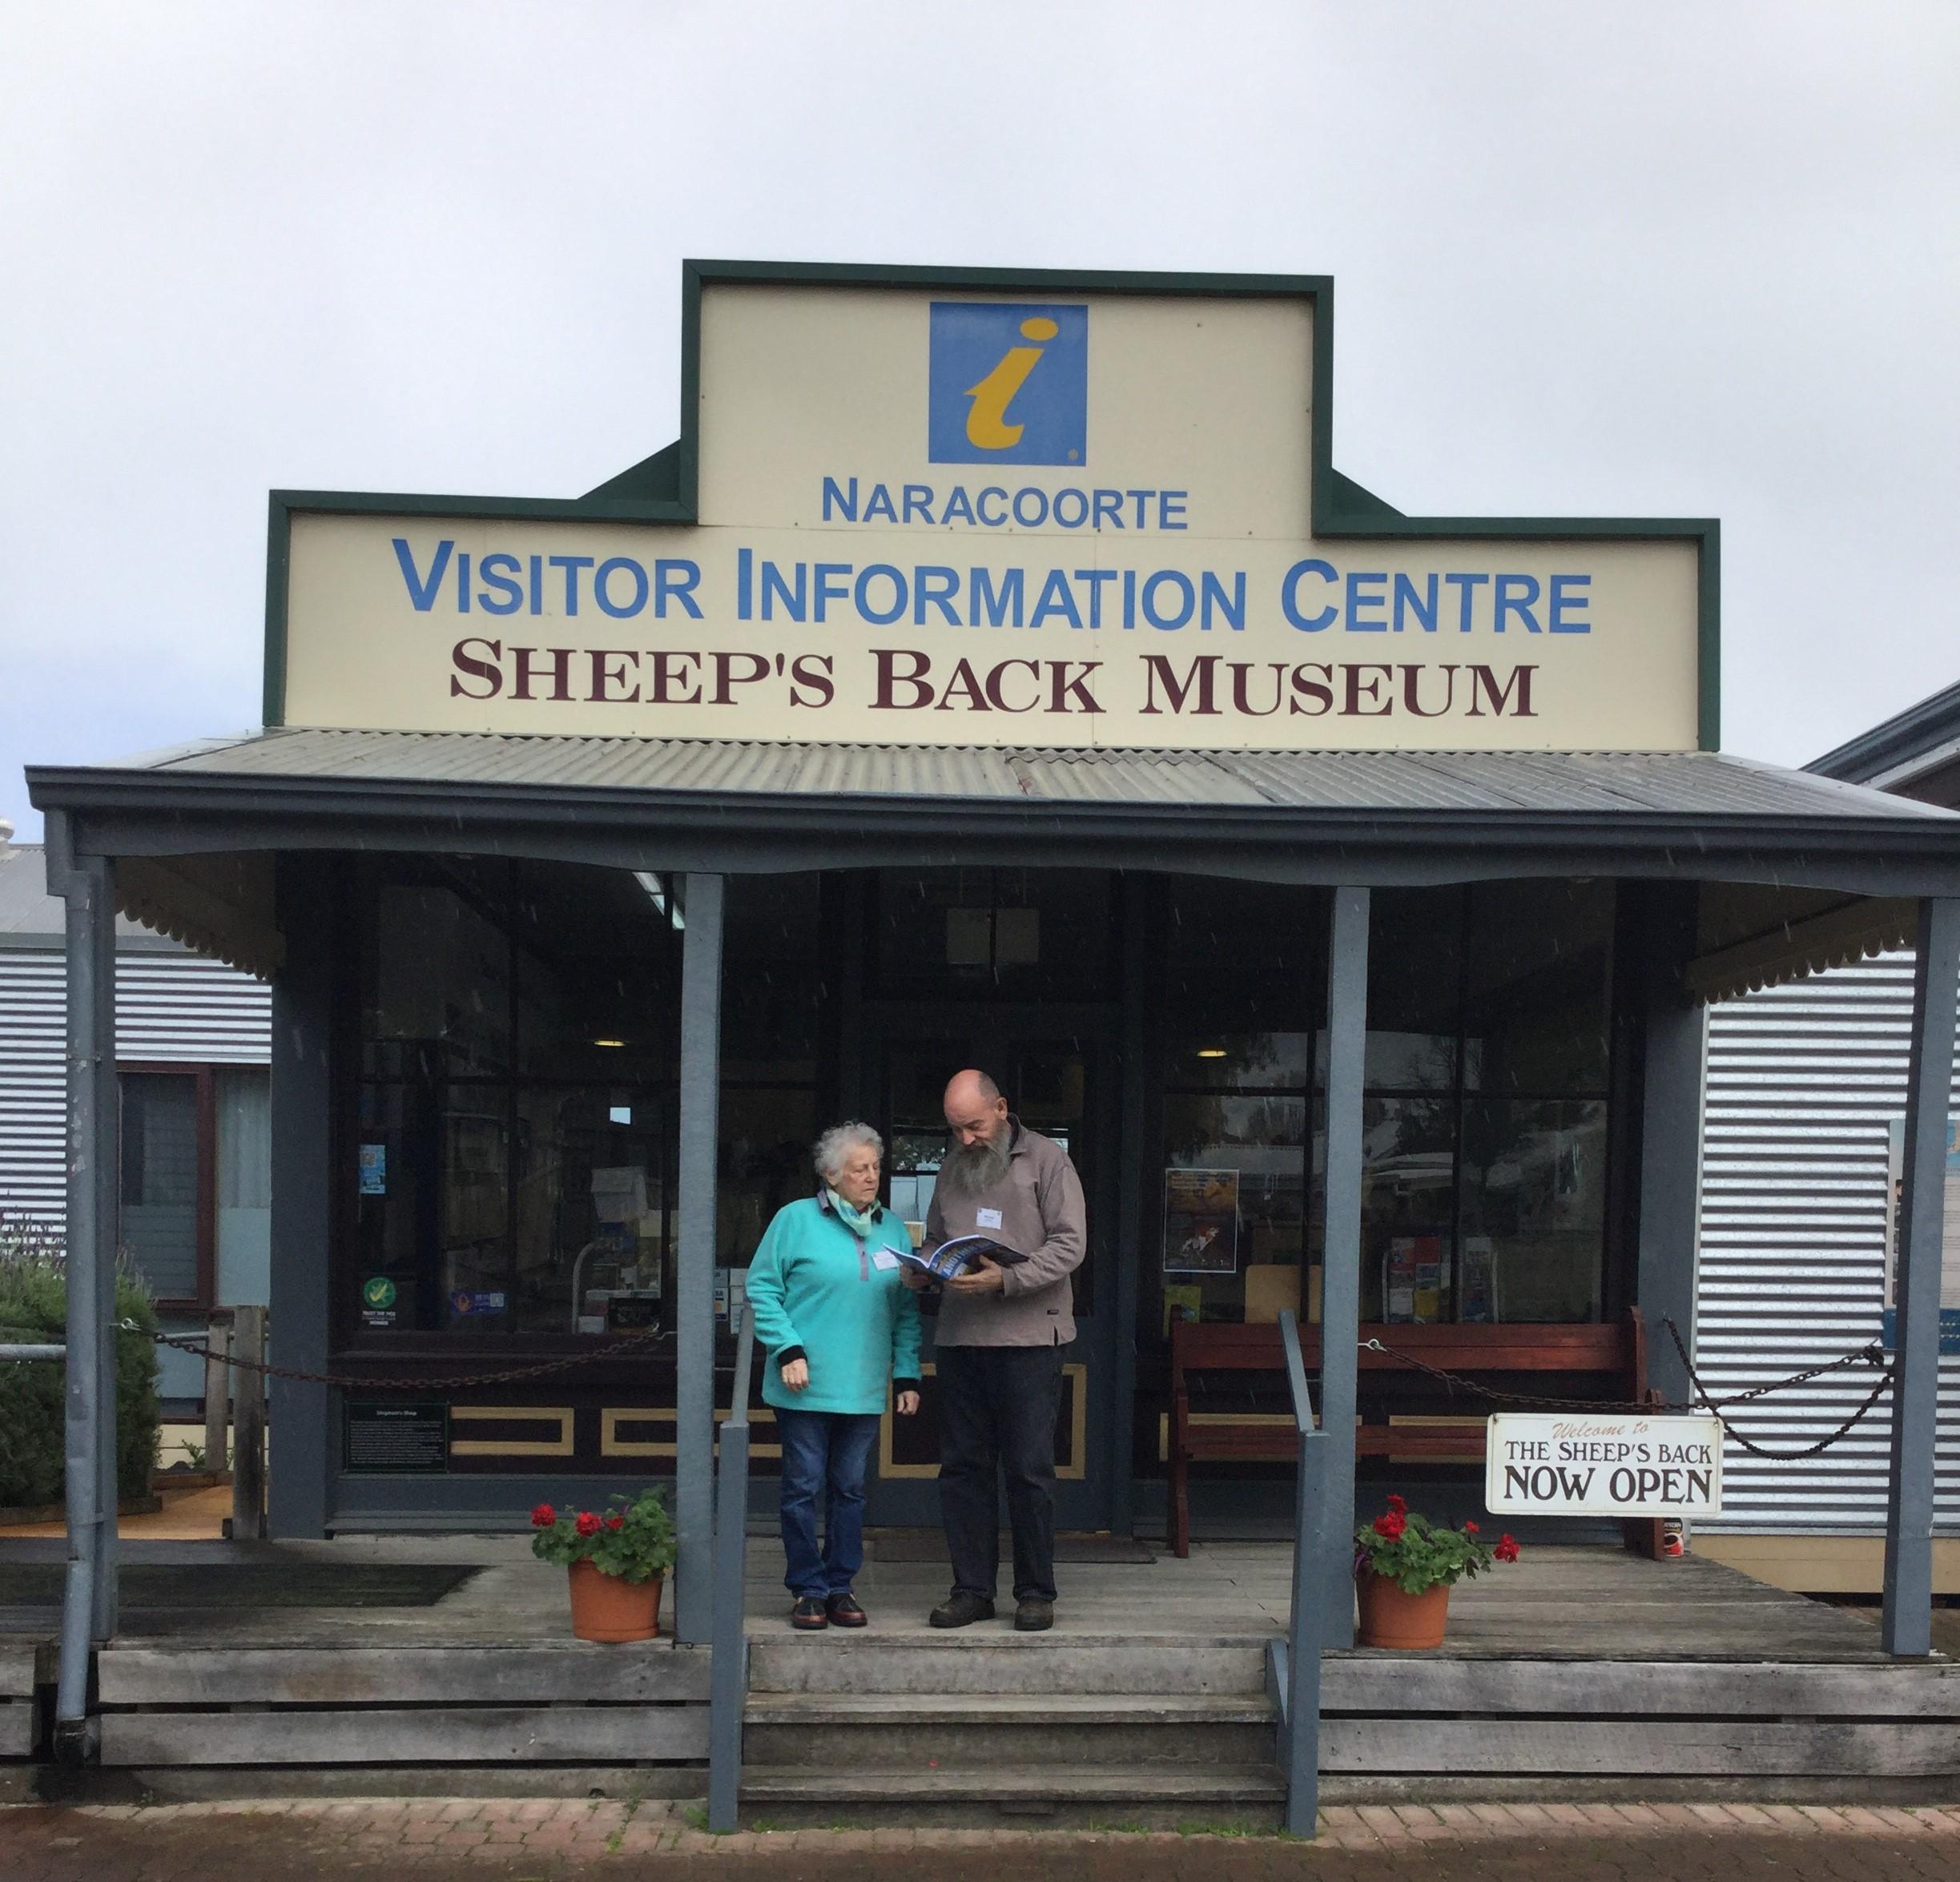 Naracoorte Visitor Information Centre